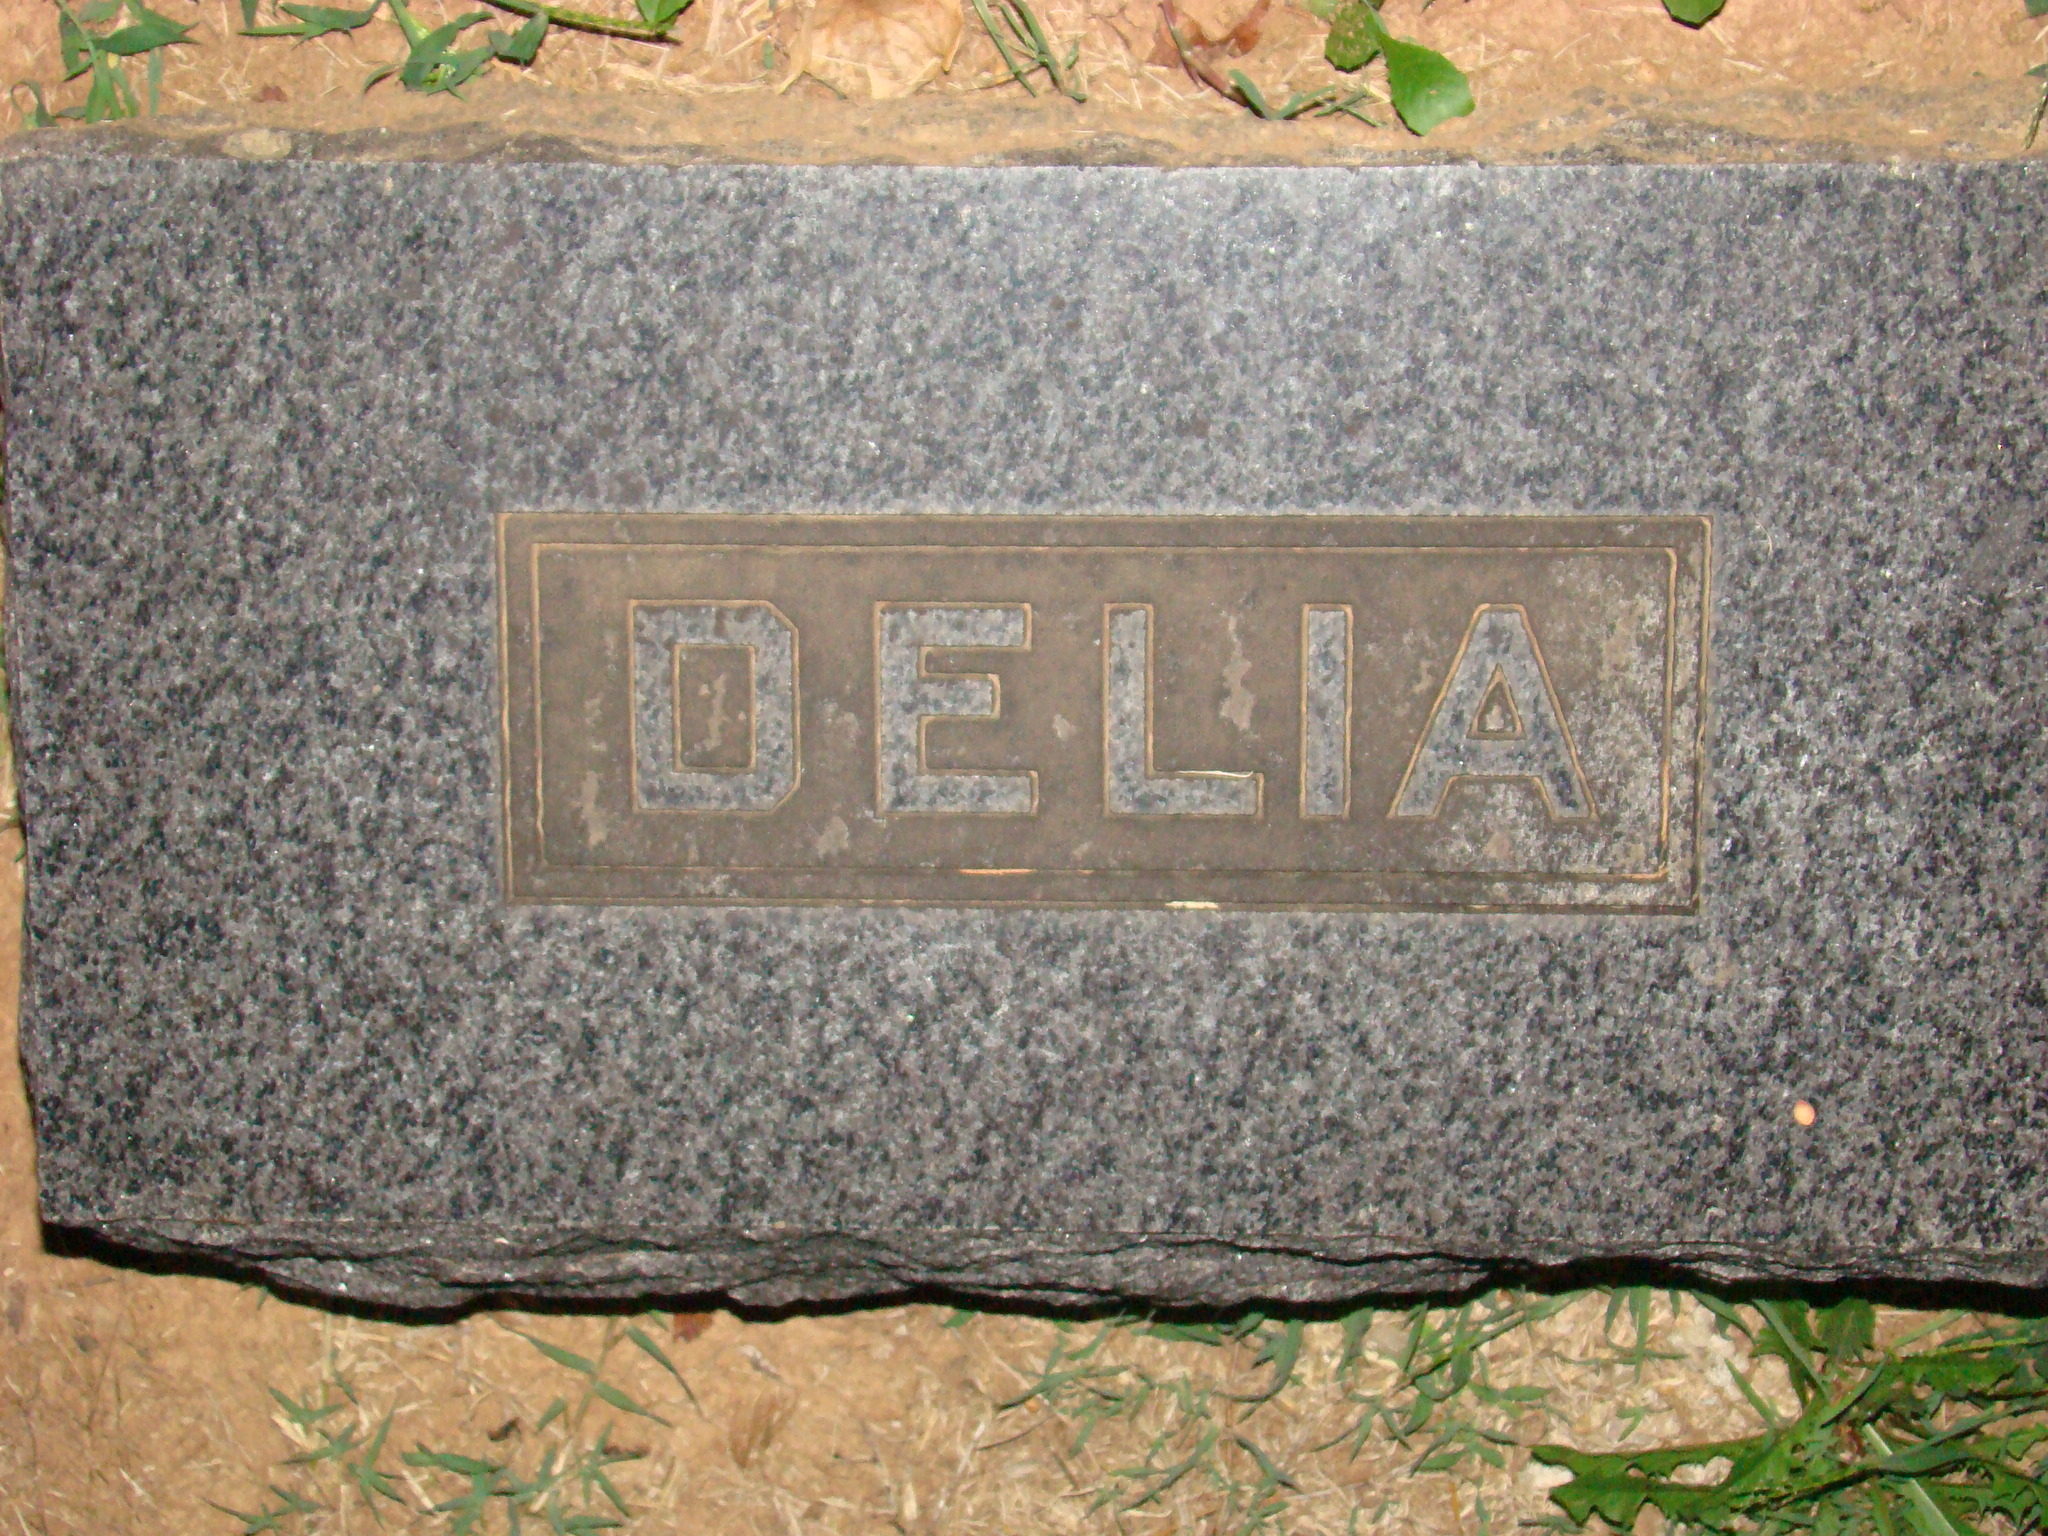 Delia Altemiller